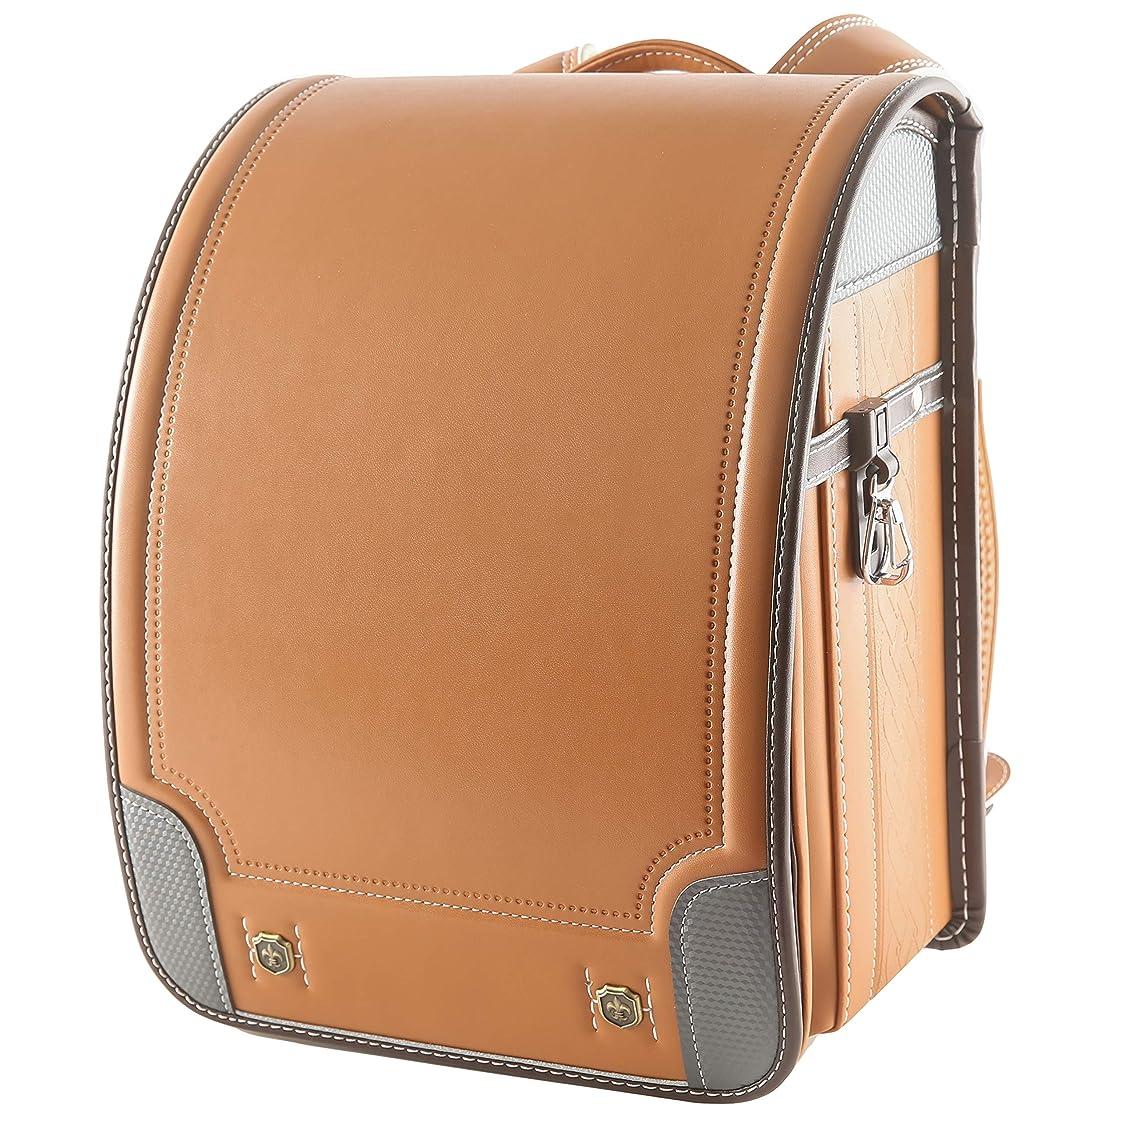 Ashmore ランドセル 小学生 型落ち オートロック 2019年度 6年間質量保証 通学鞄 かばん 男の子 高級人工皮革 A4フラットファイル対応 大容量 超軽量